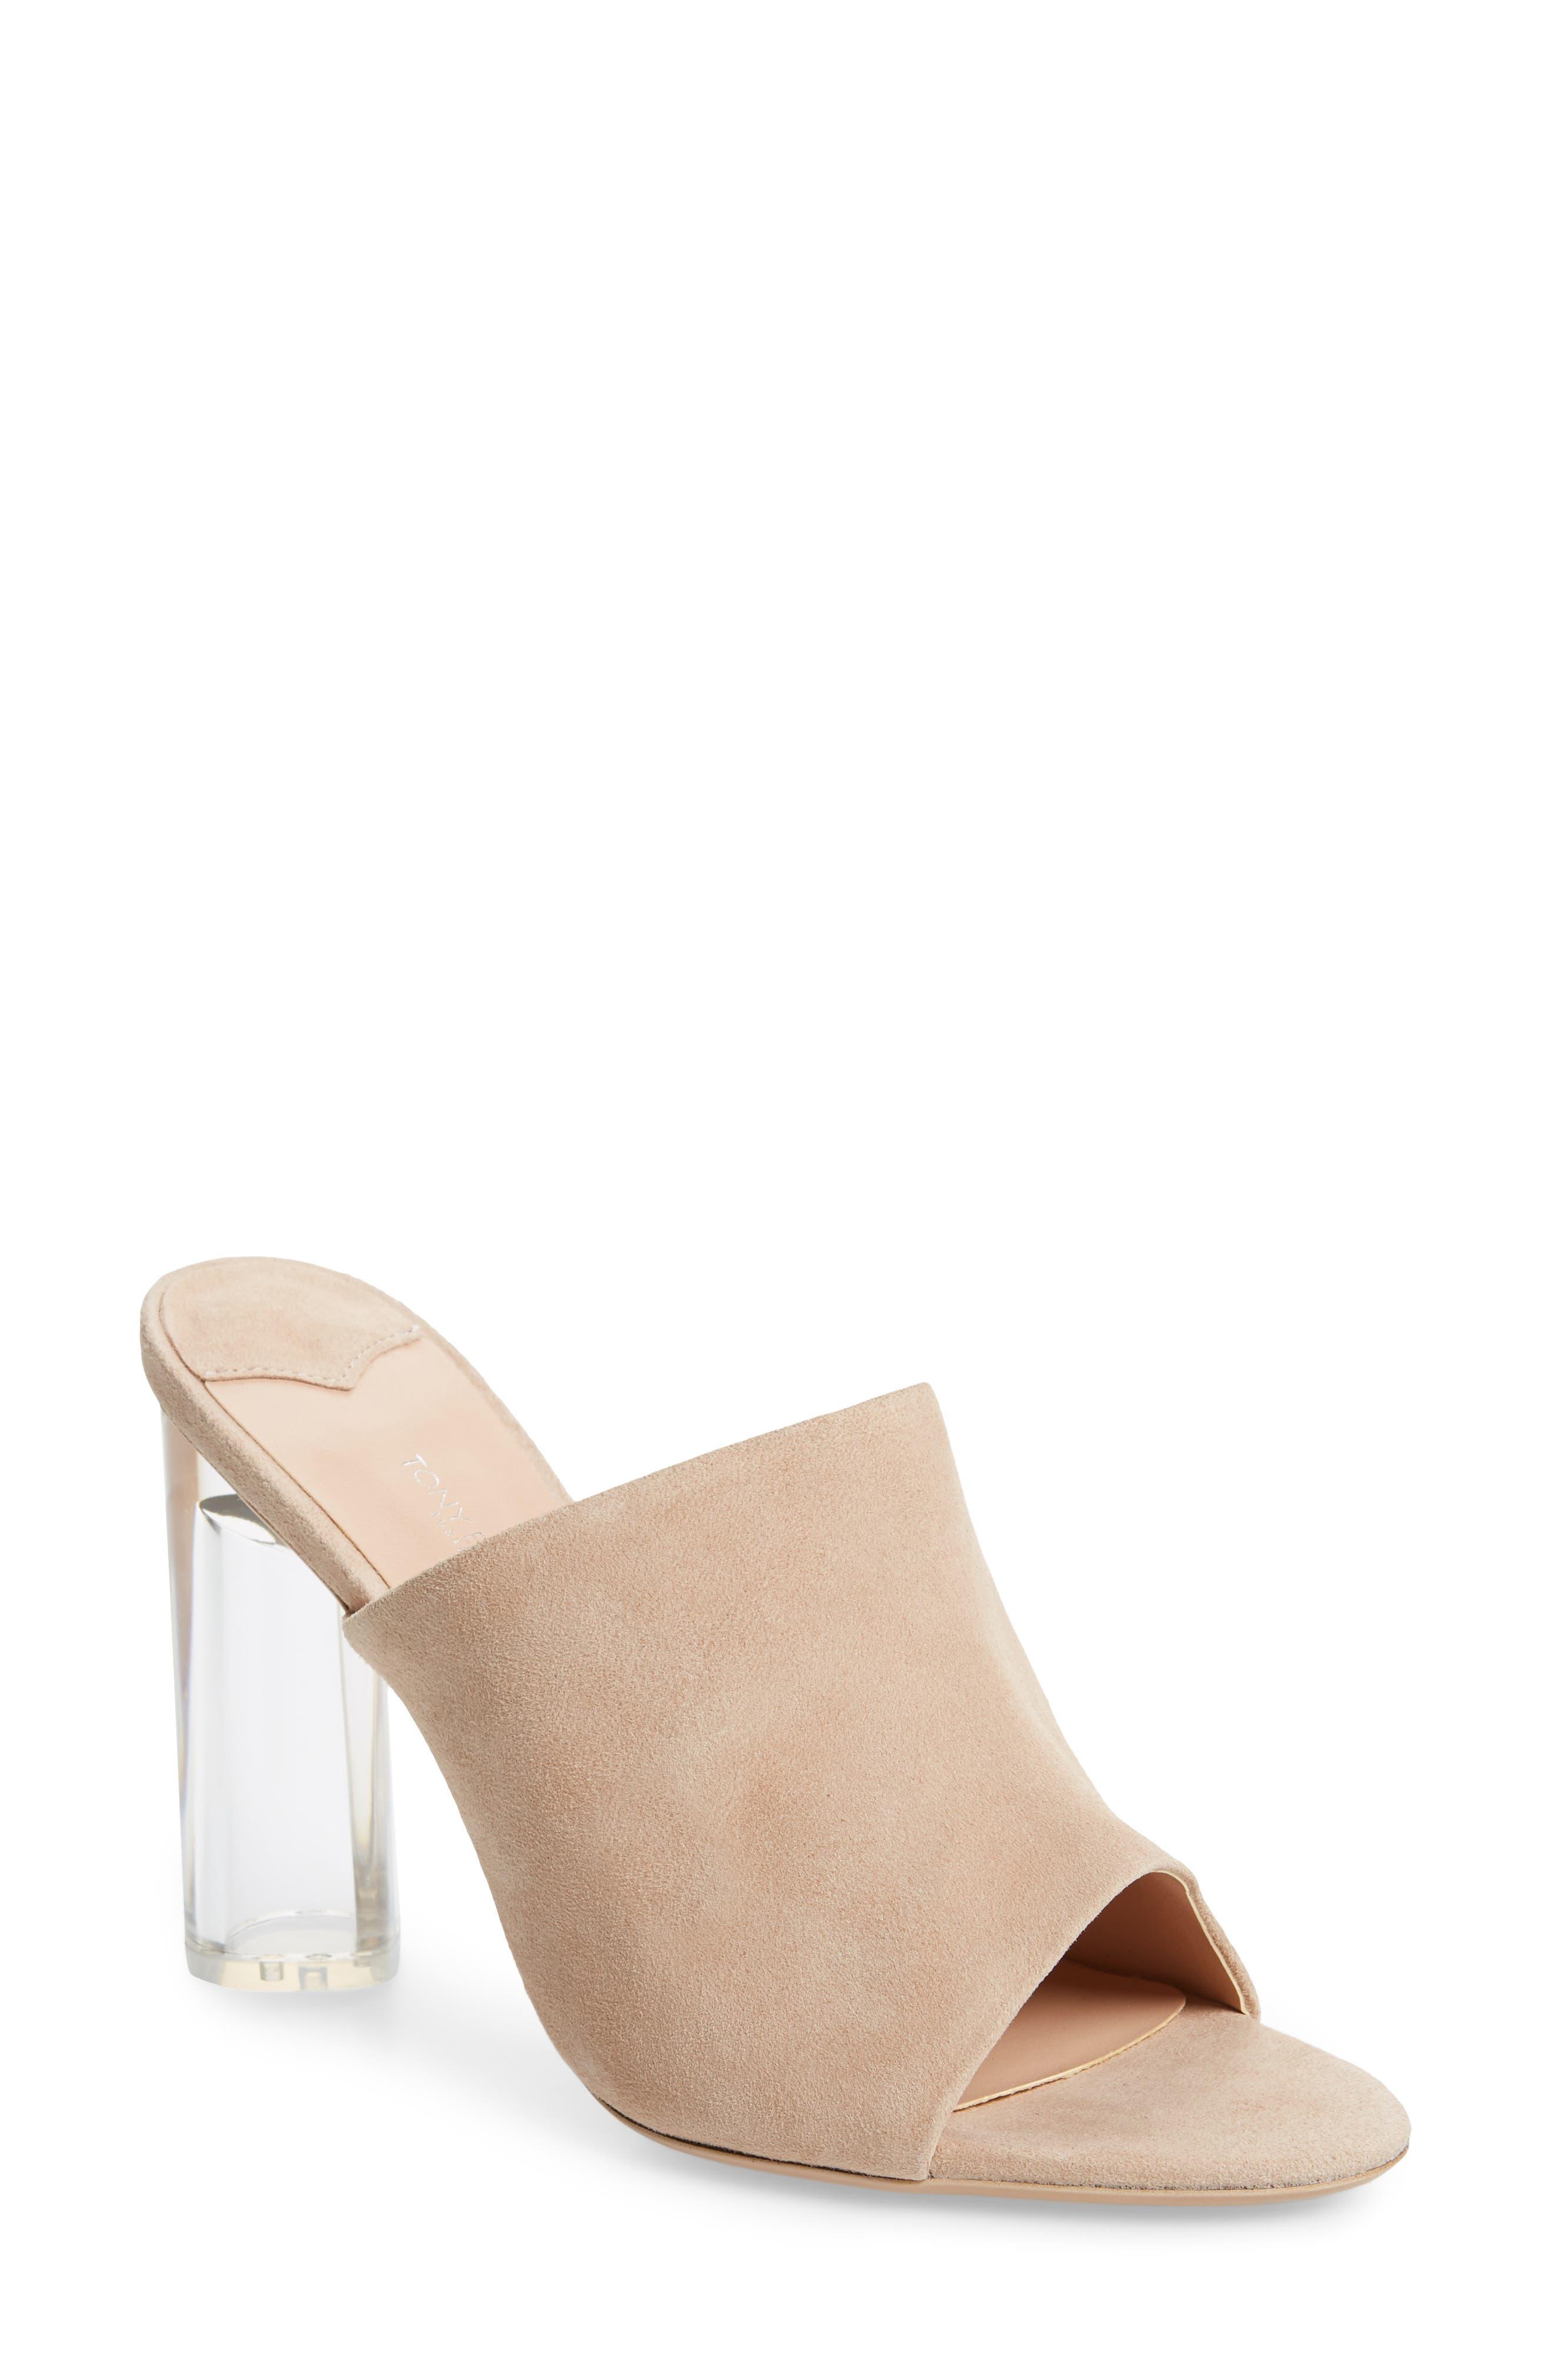 Tony Bianco Takoda Clear Heel Slide Sandal, Pink